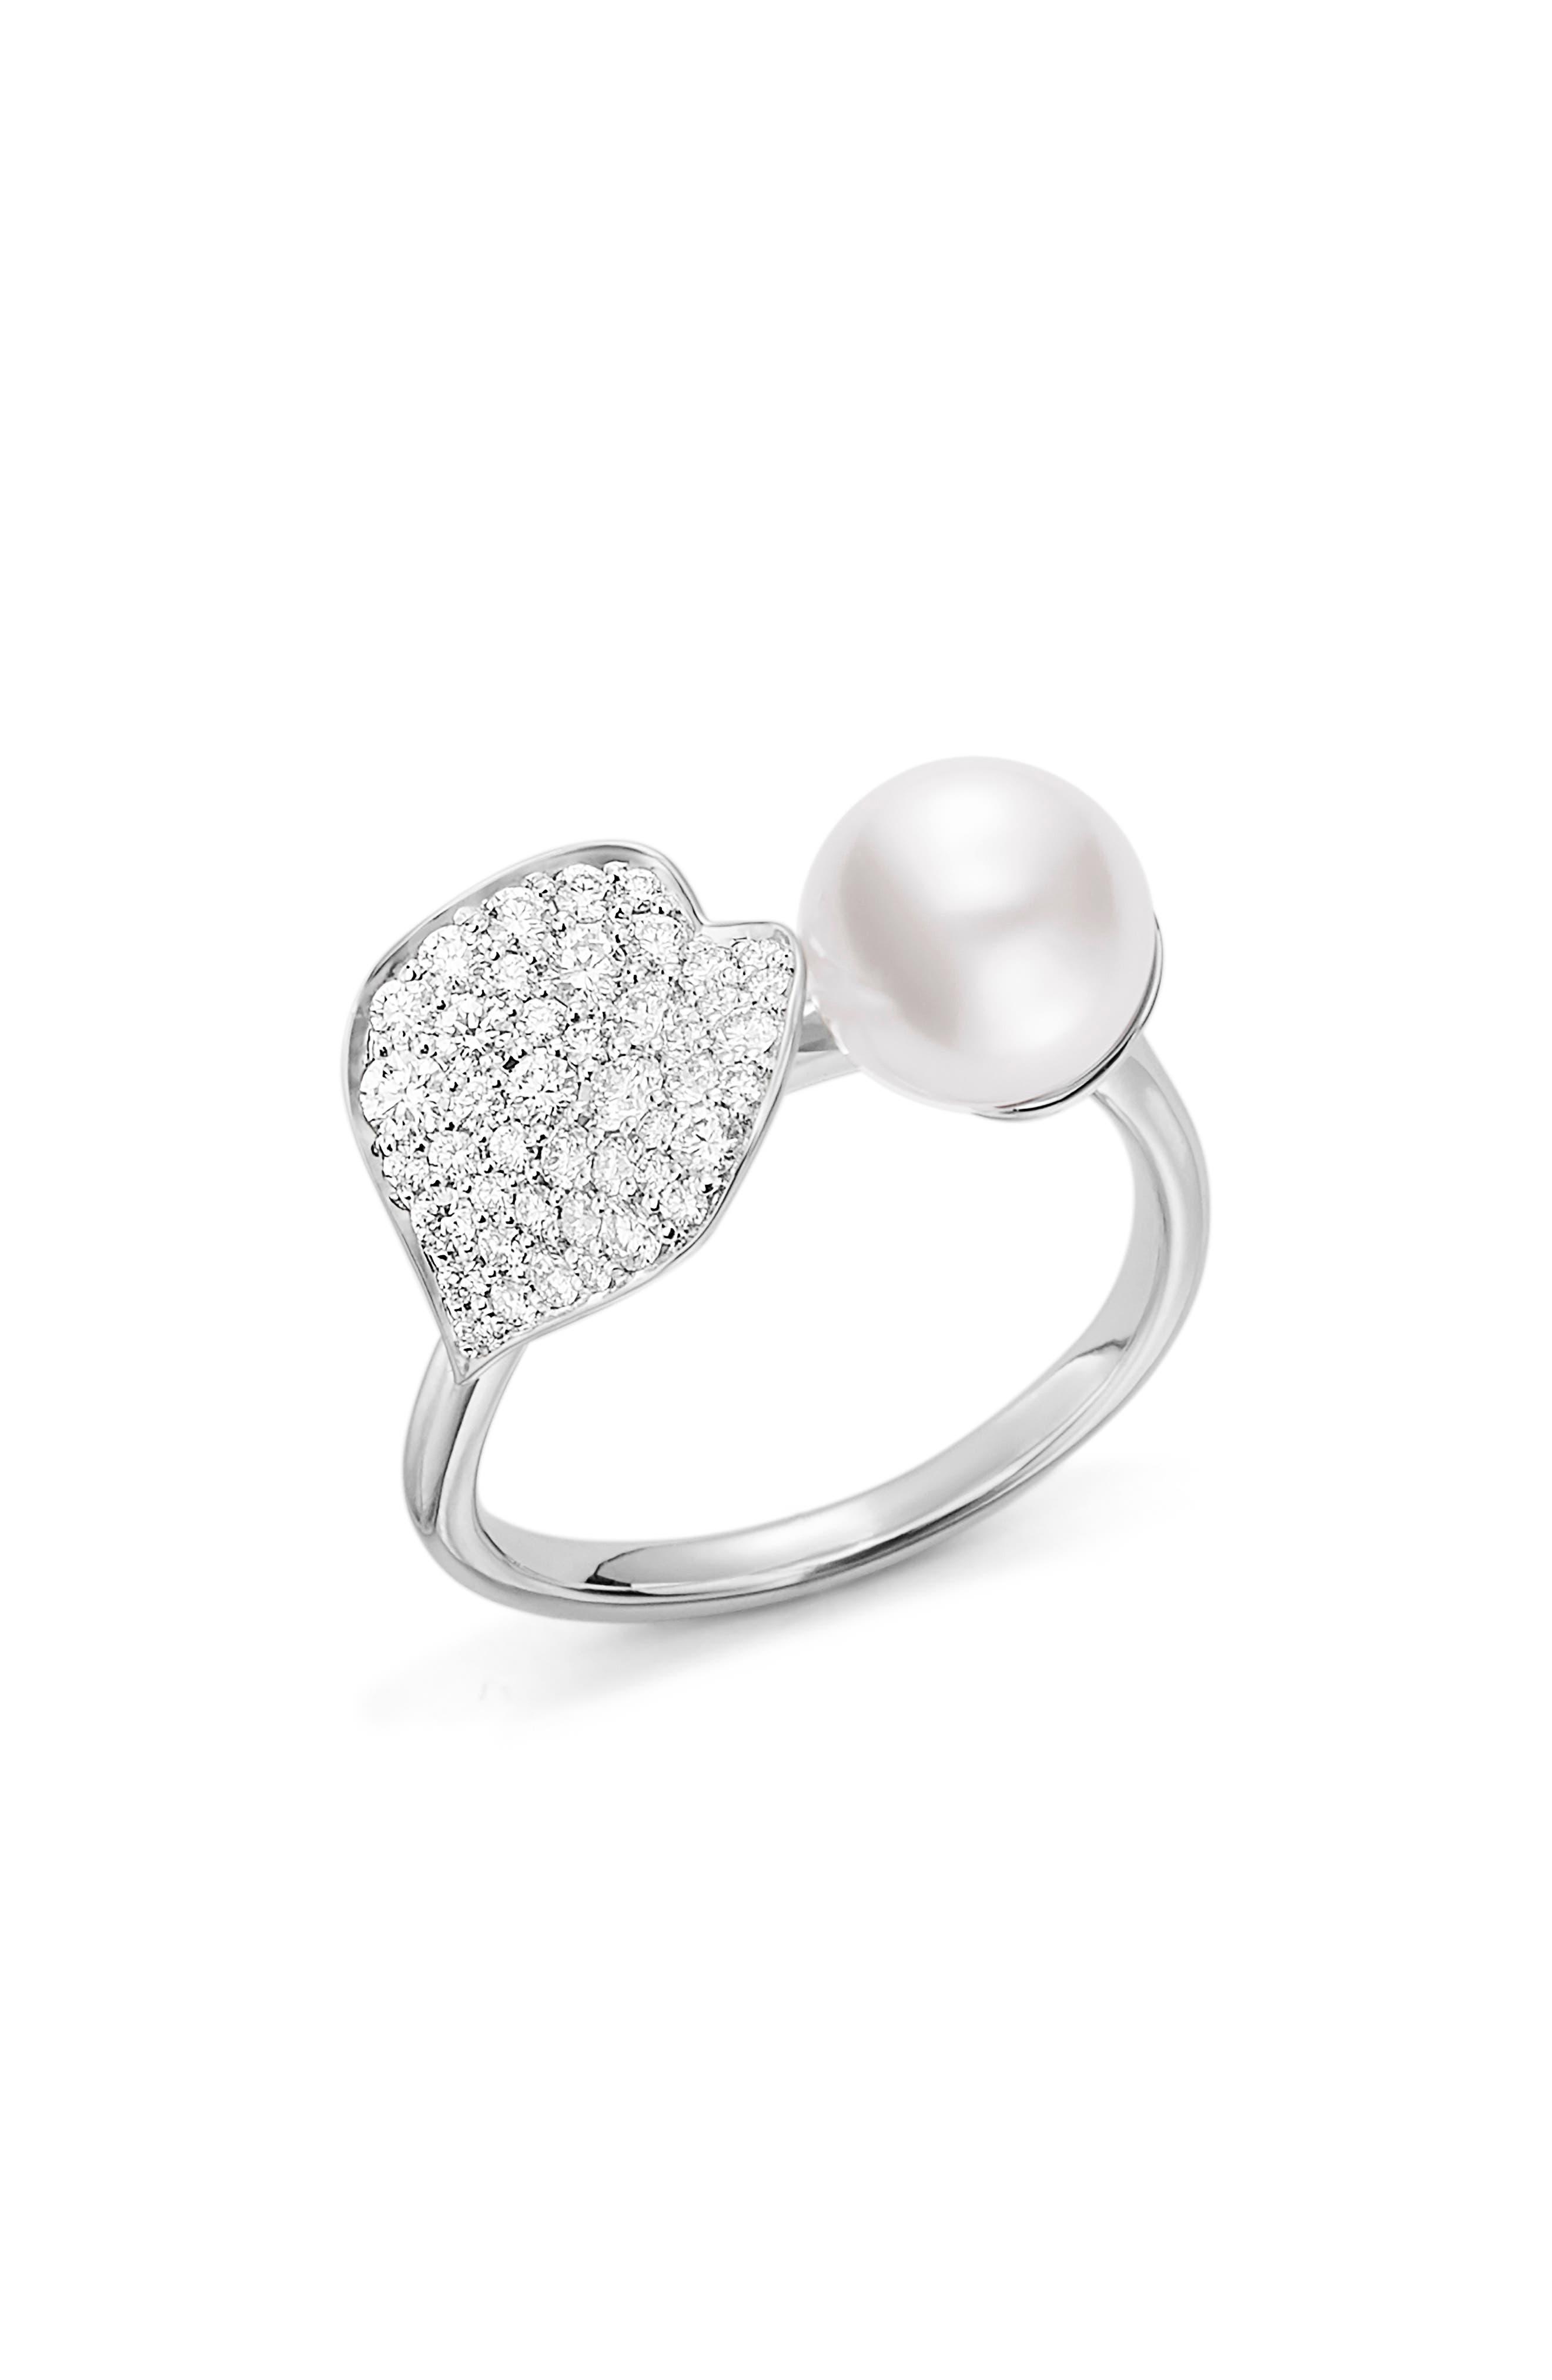 Diamond & Cultured Pearl Ring